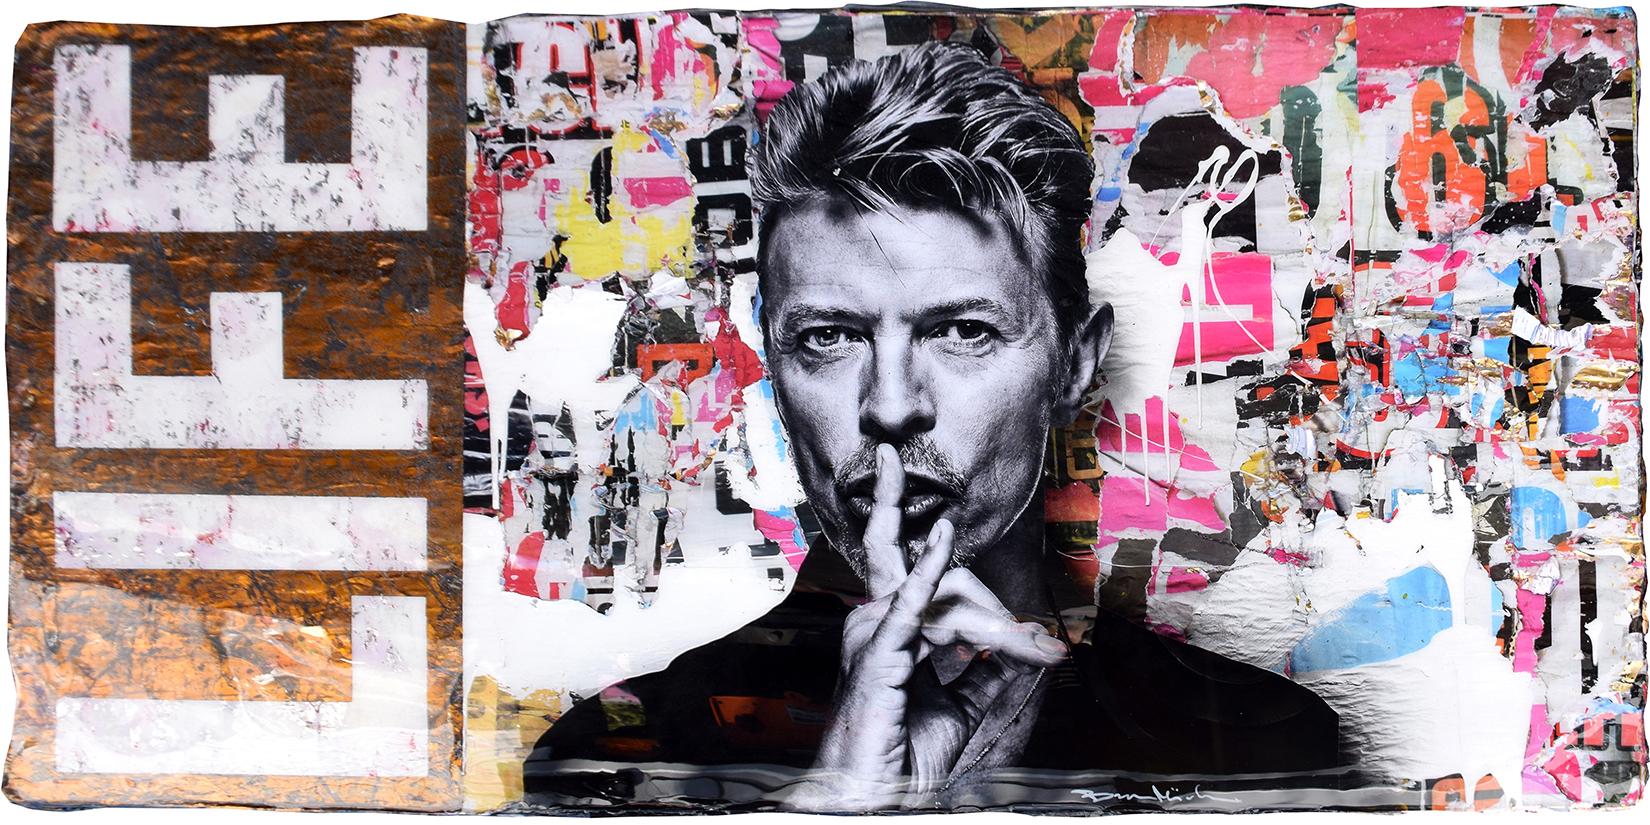 Bram Reijnders - Bowie (LIFE) , 8031-012-061